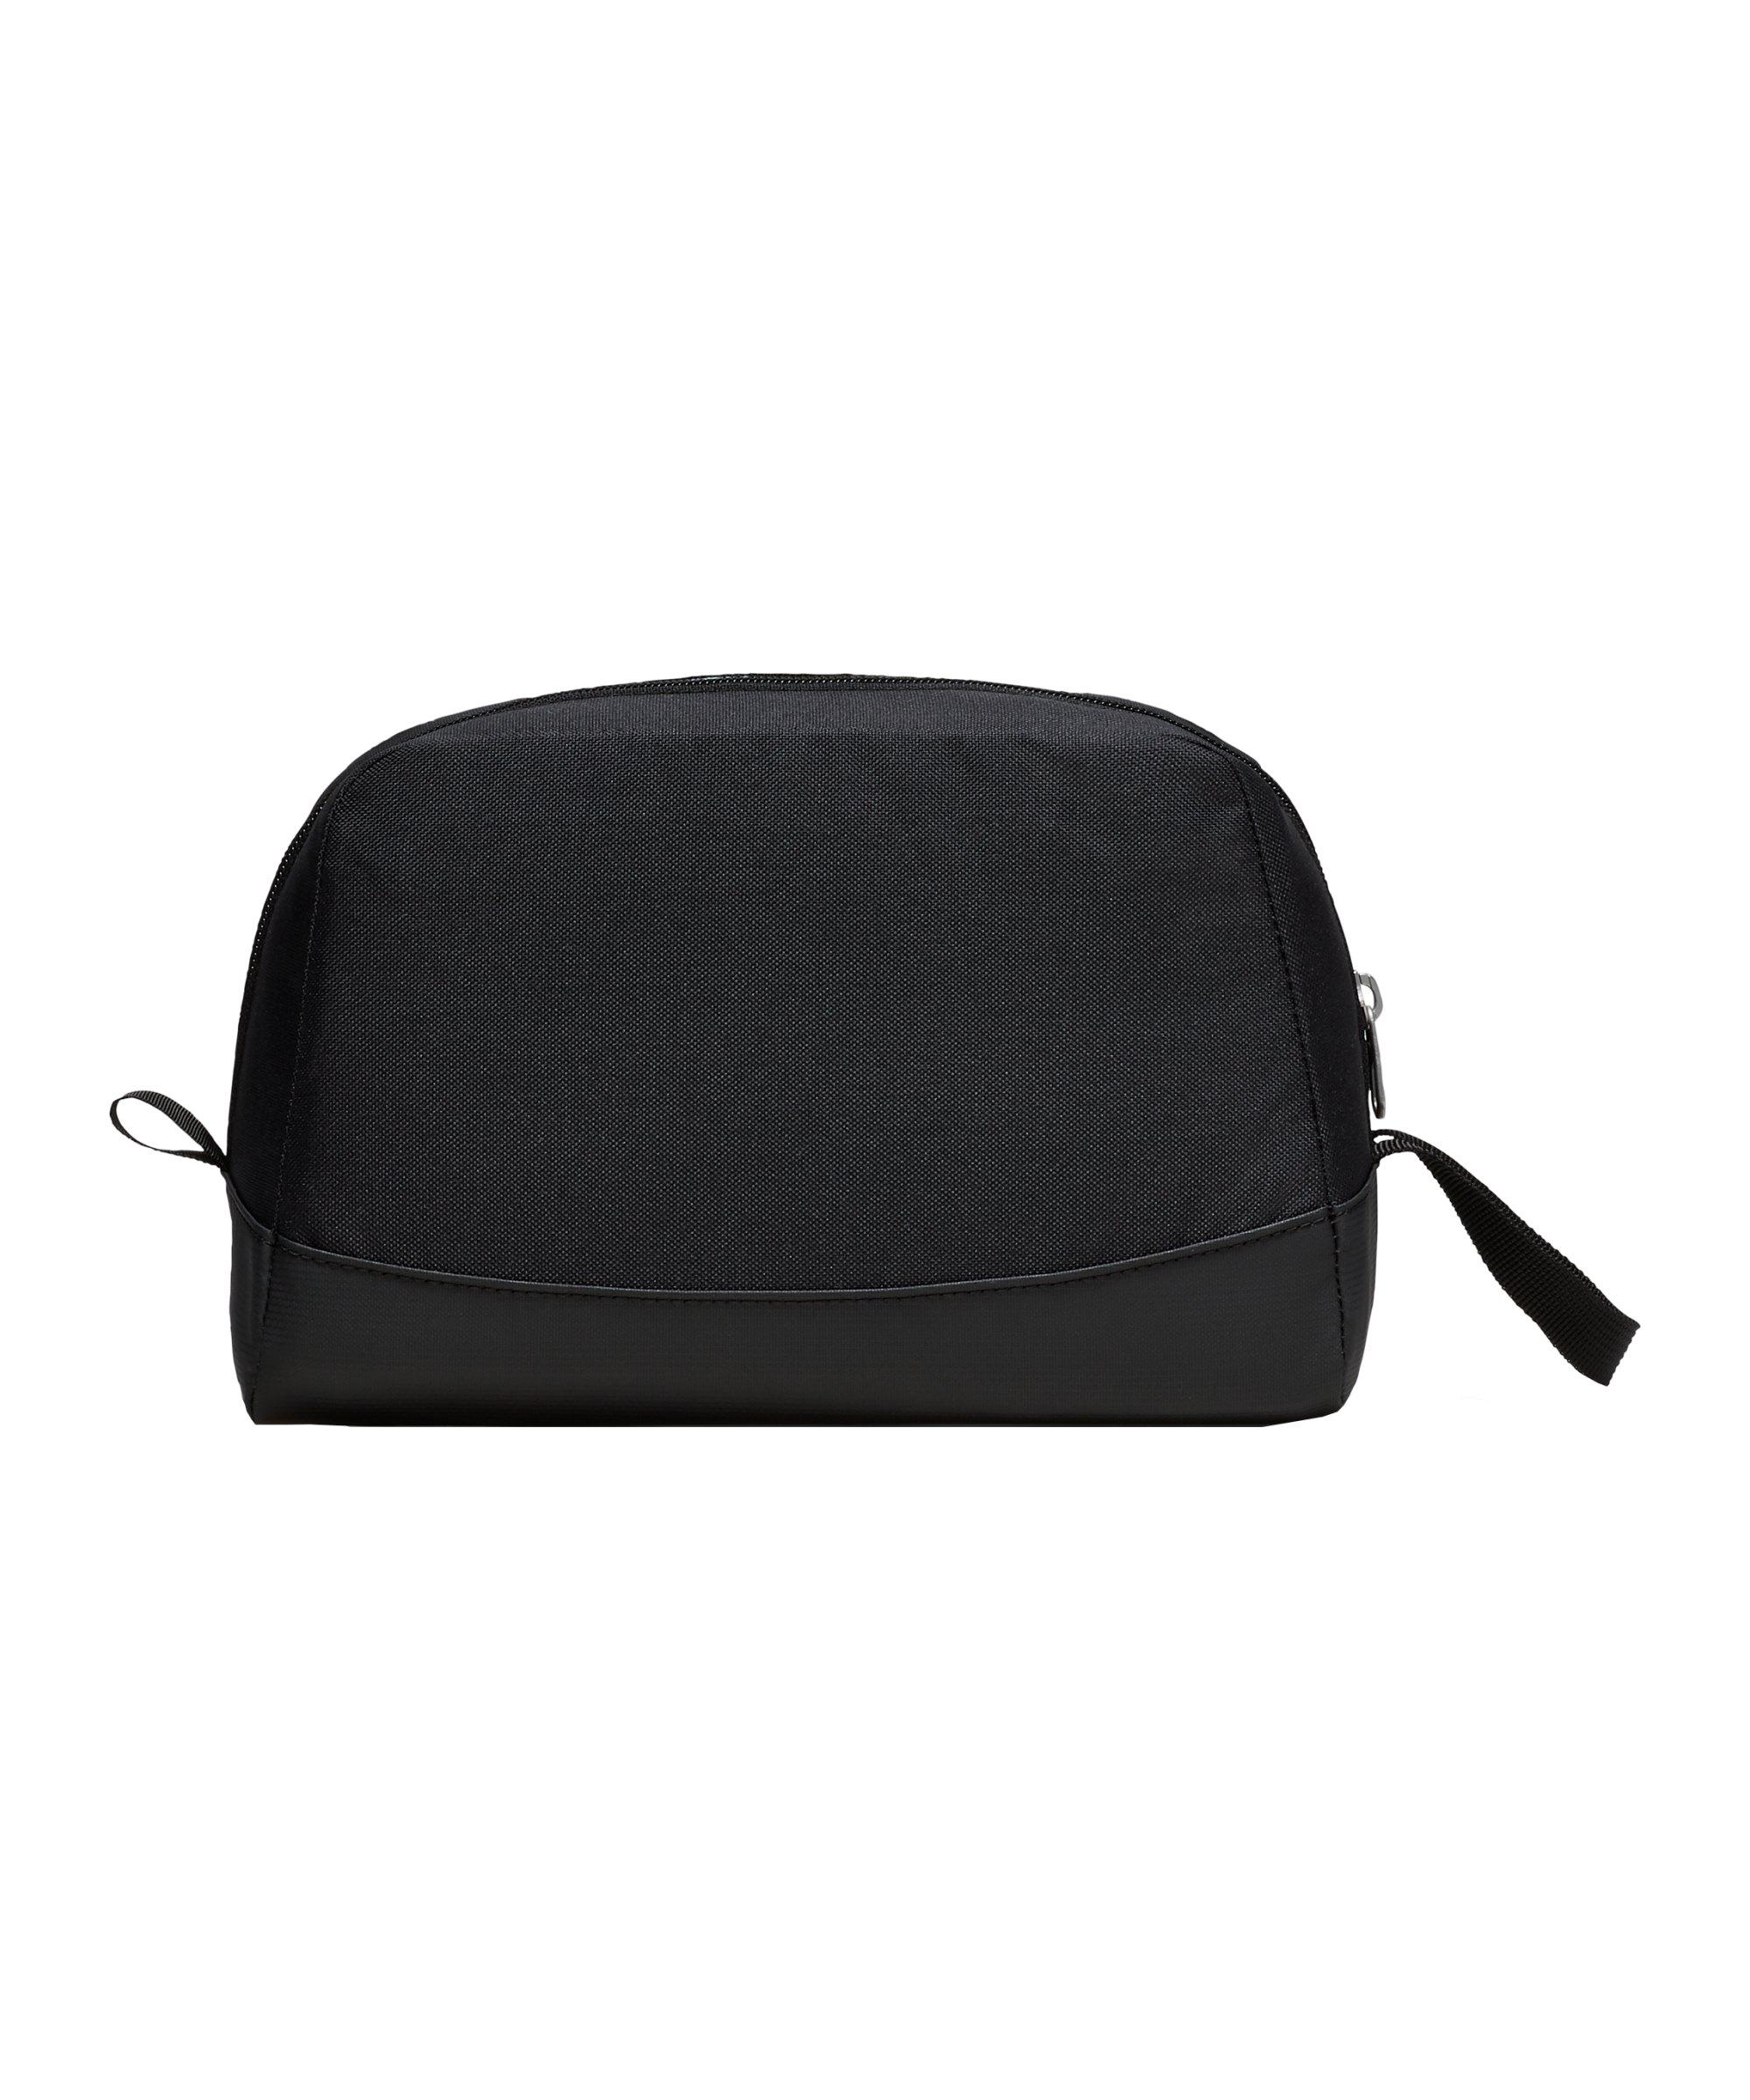 edaf1cda5044e ... Nike Club Team Swoosh Toiletry Bag Tasche F010 - schwarz ...